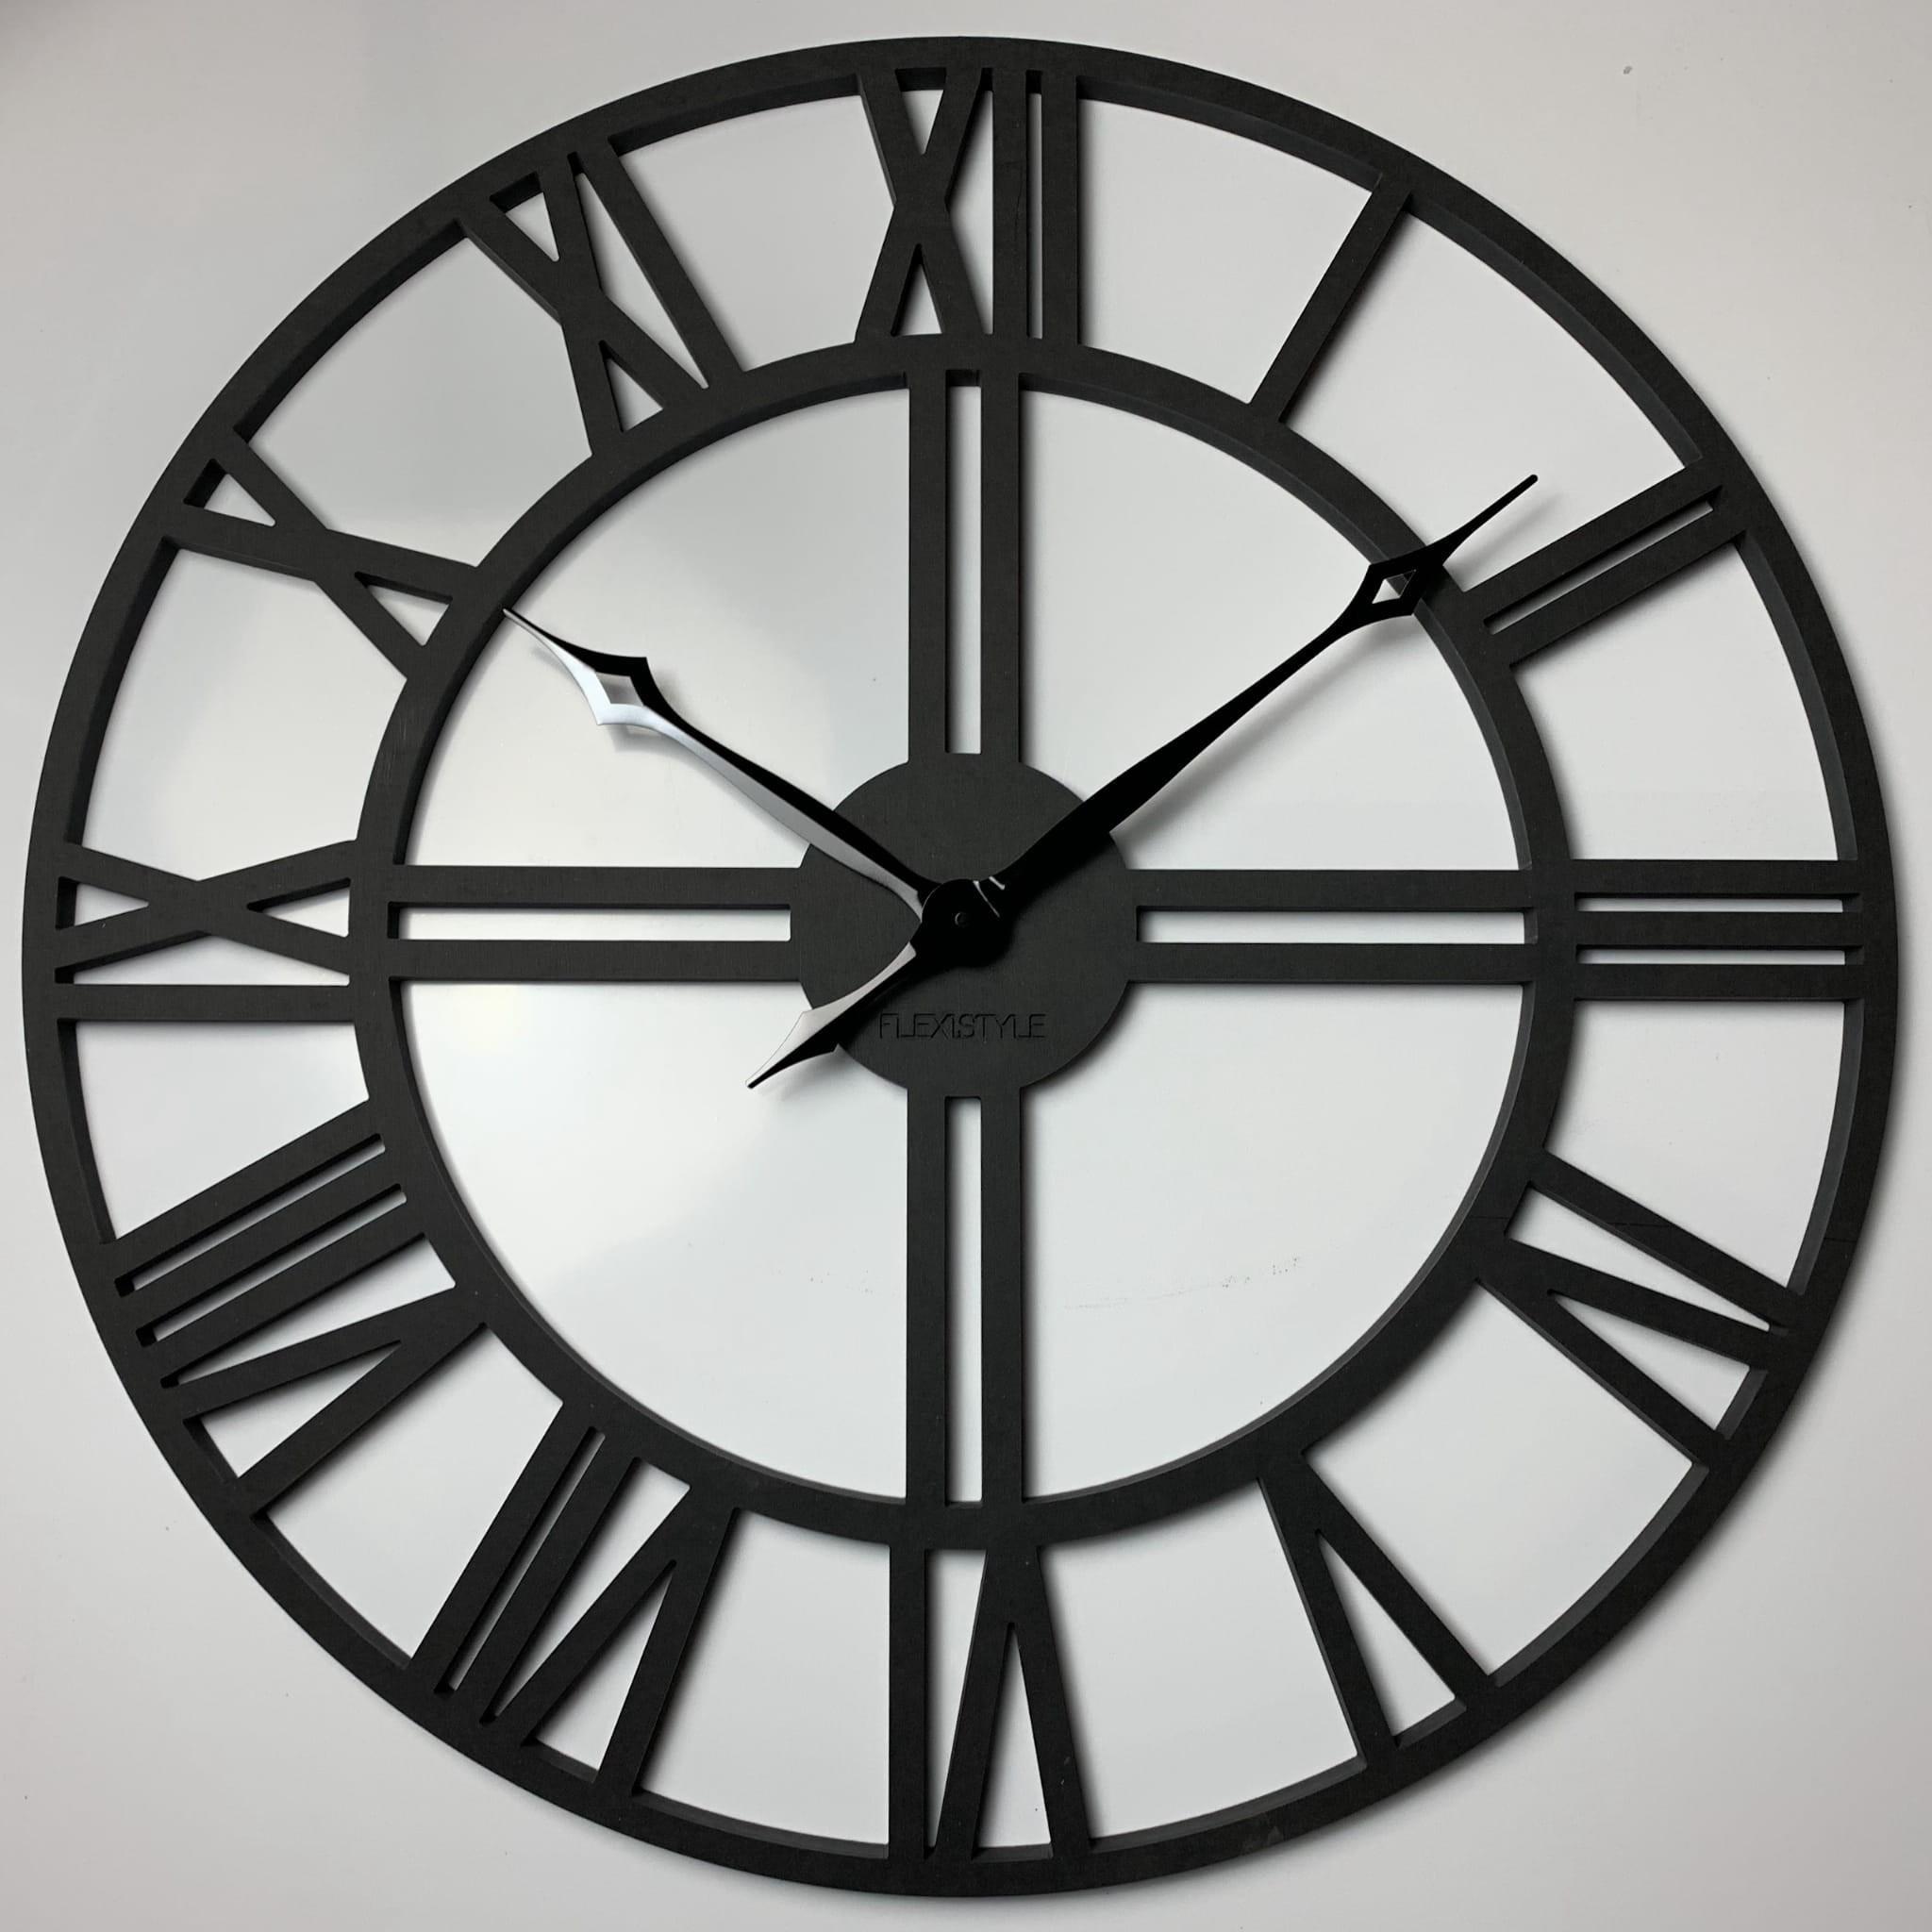 DomTextilu Čierne hodiny na stenu zdreva LOFT GRANDE 80cm 16605